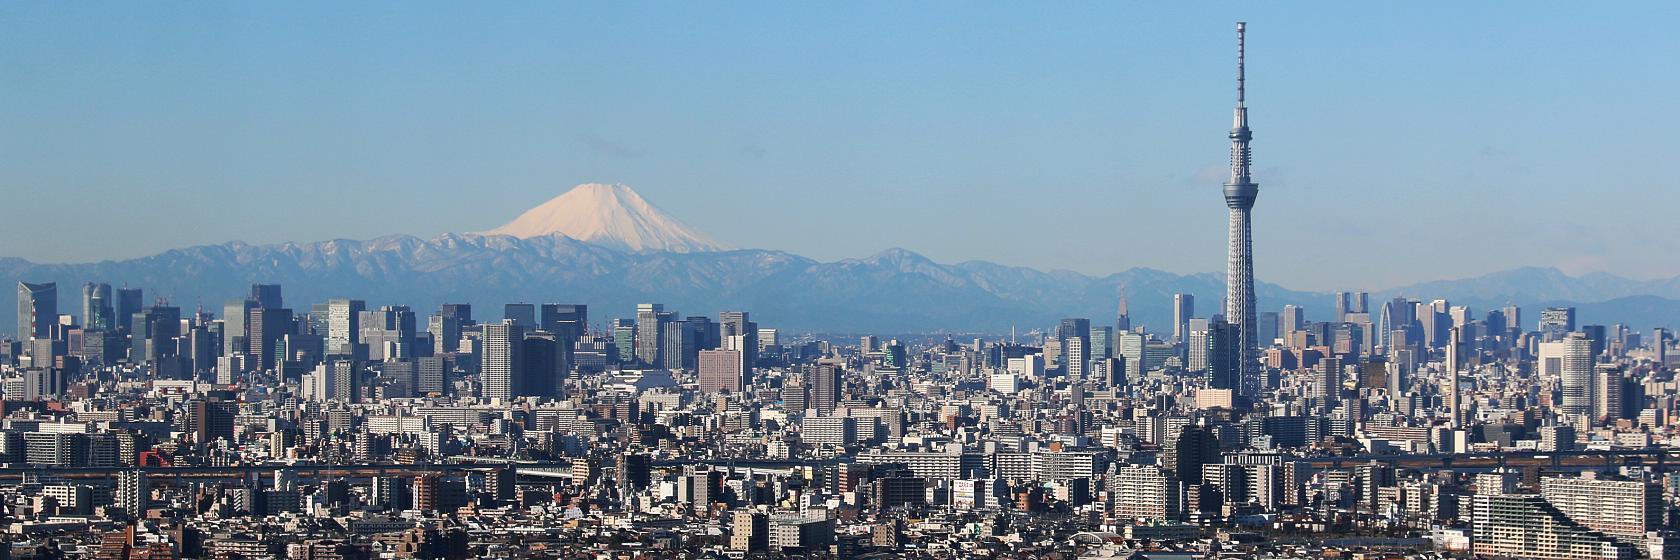 Tokyo Tour Guide